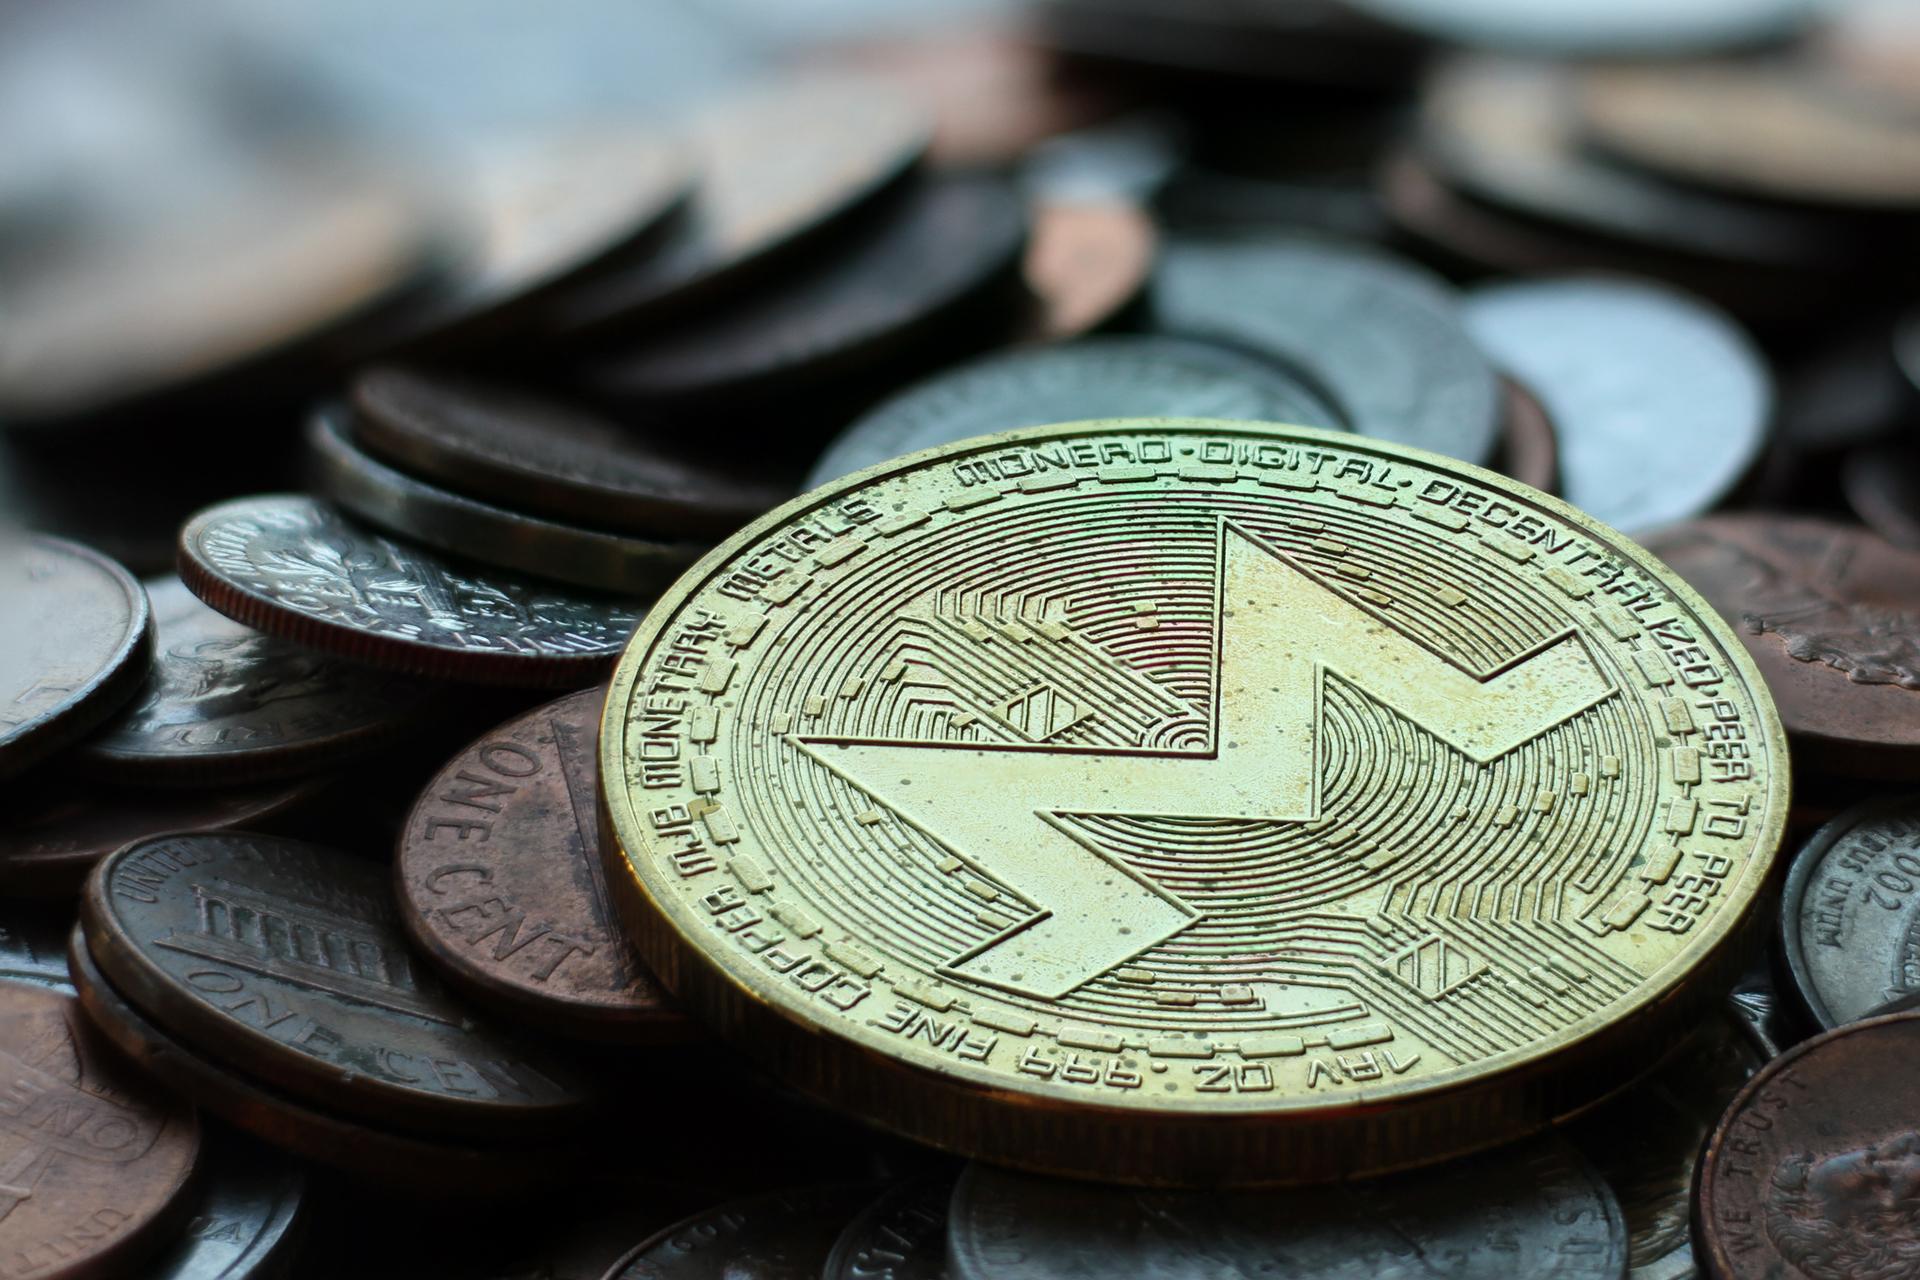 monero similar coins